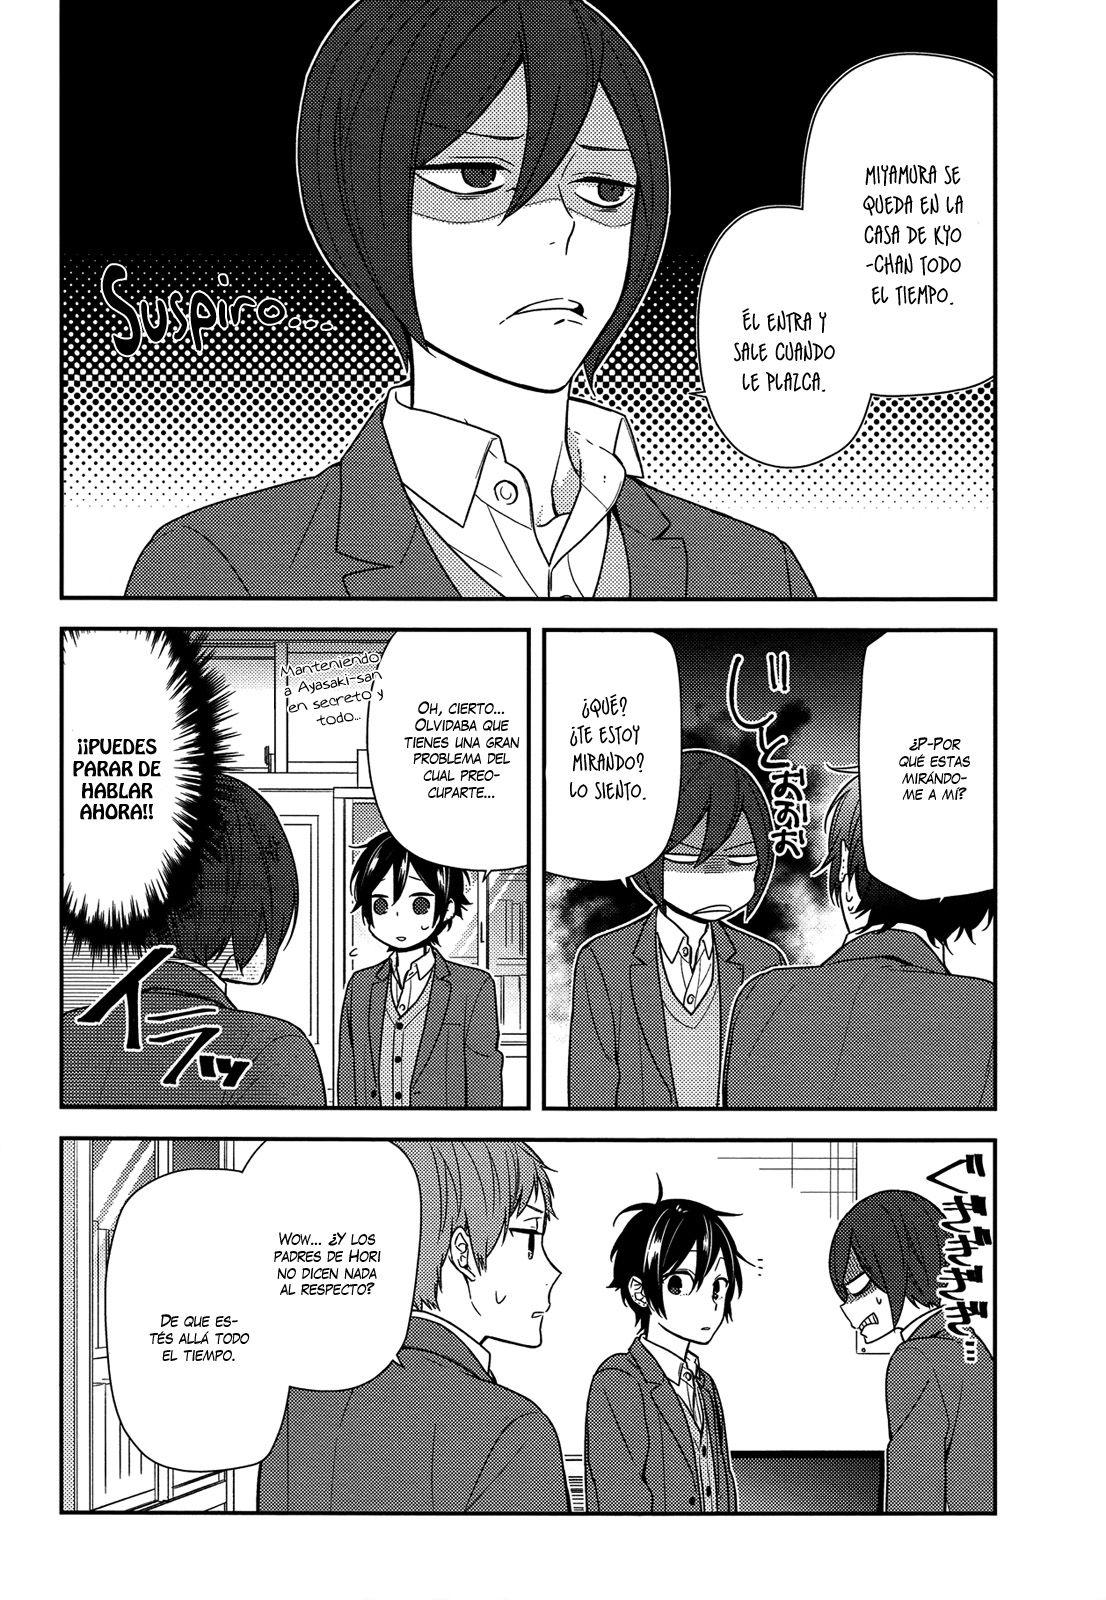 http://c5.ninemanga.com/es_manga/pic2/19/1043/515638/8e5b478921e08e89d44d9ead06957f74.jpg Page 5